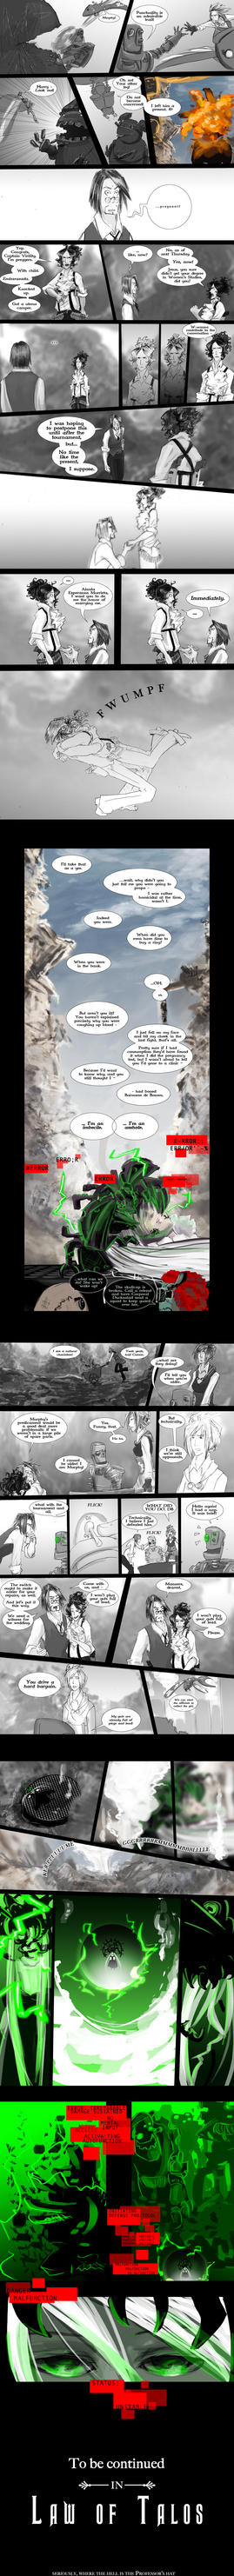 LoT: Ars Militaria, page IV by terriblenerd